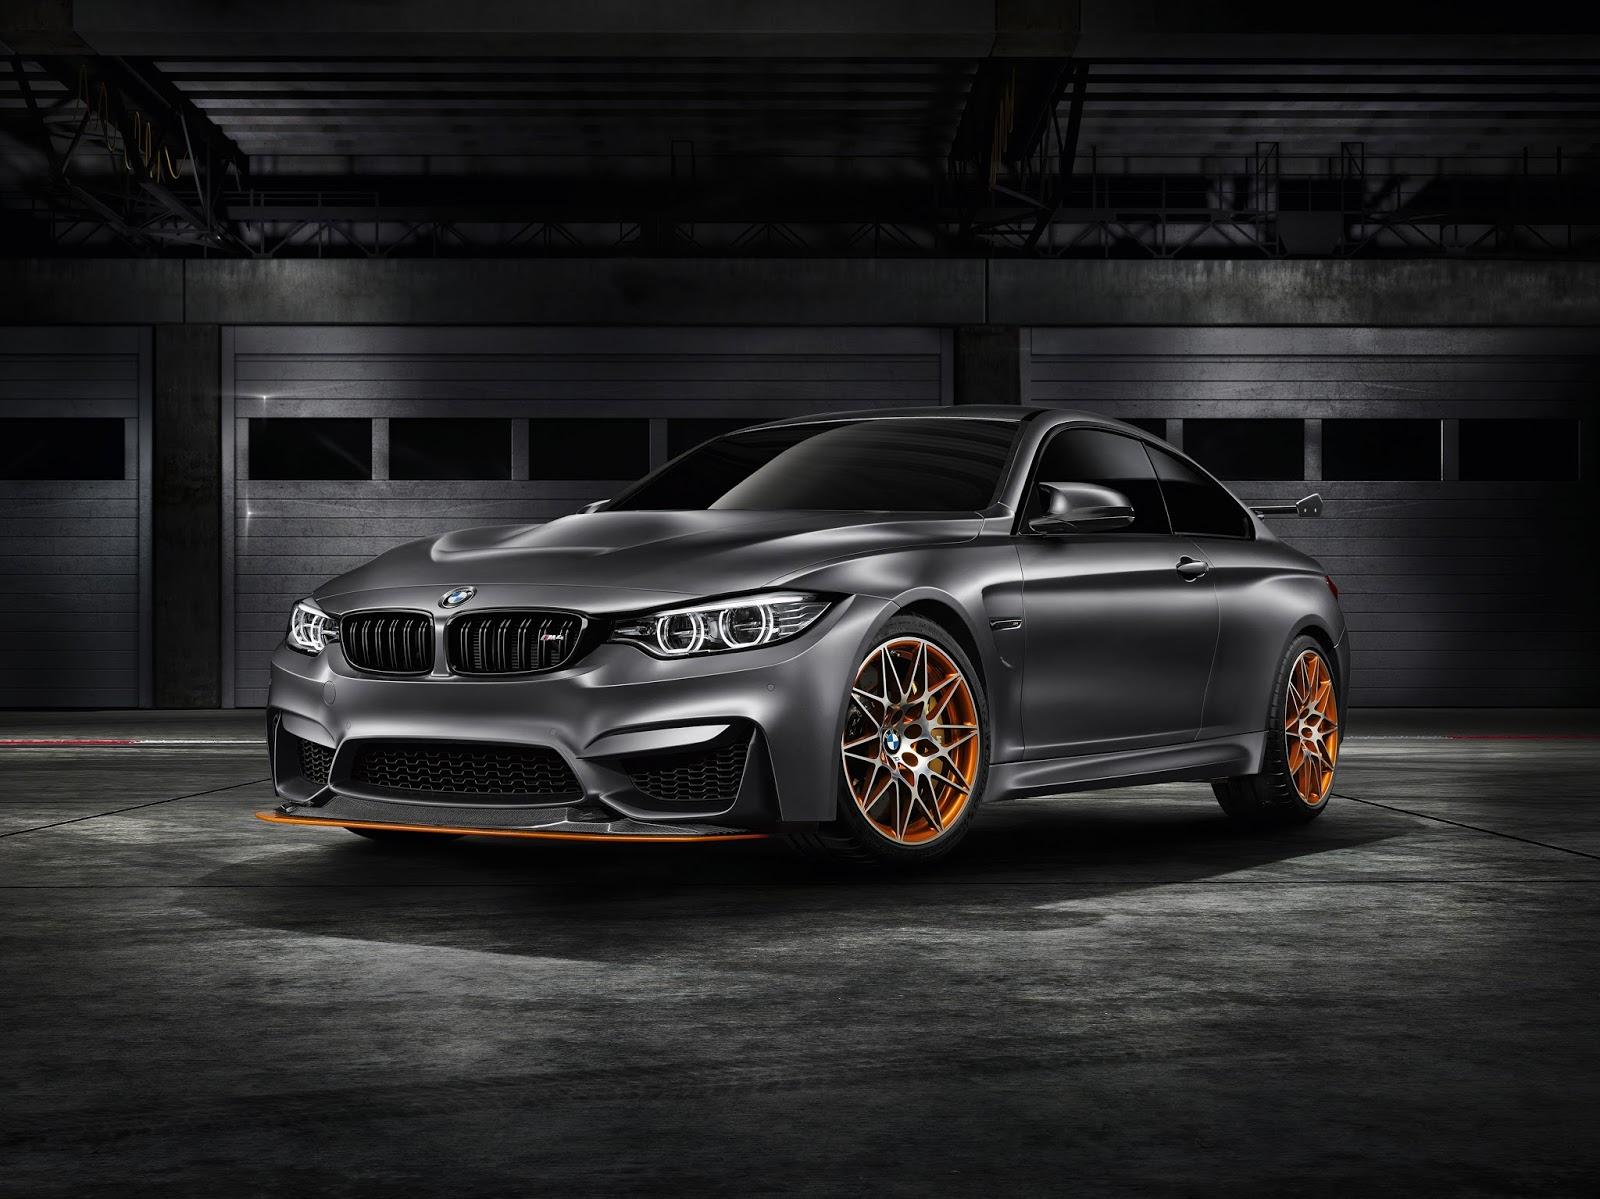 f1 7 Η απάντηση της BMW στη Giulia, λέγεται M4 GTS Alfa Romeo Giulia, BMW, BMW M4 GTS, Nurburgring, zblog